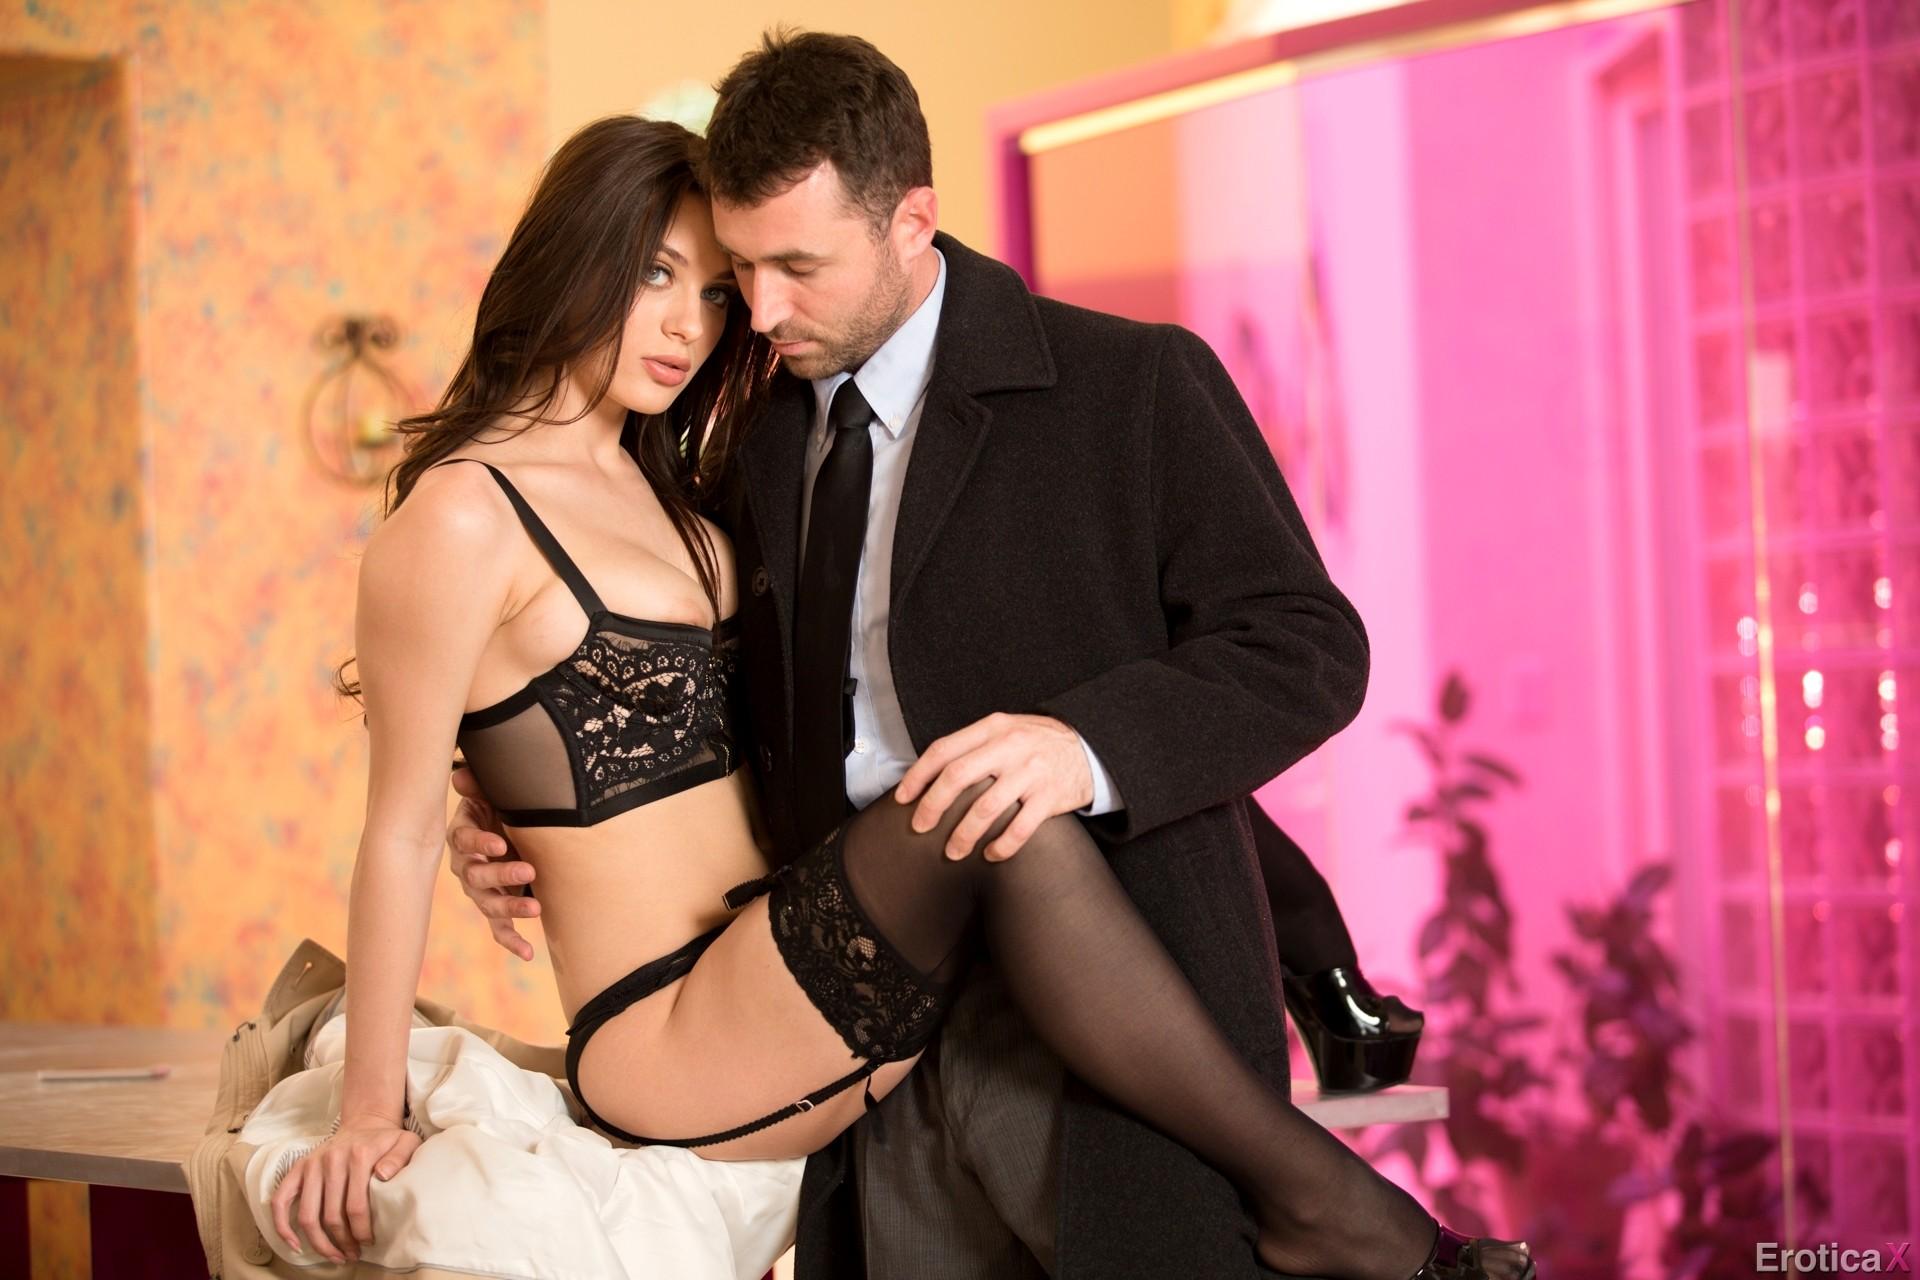 EroticaX COUPLEs PORNamp Lily Love in Serenity  XVIDEOSCOM